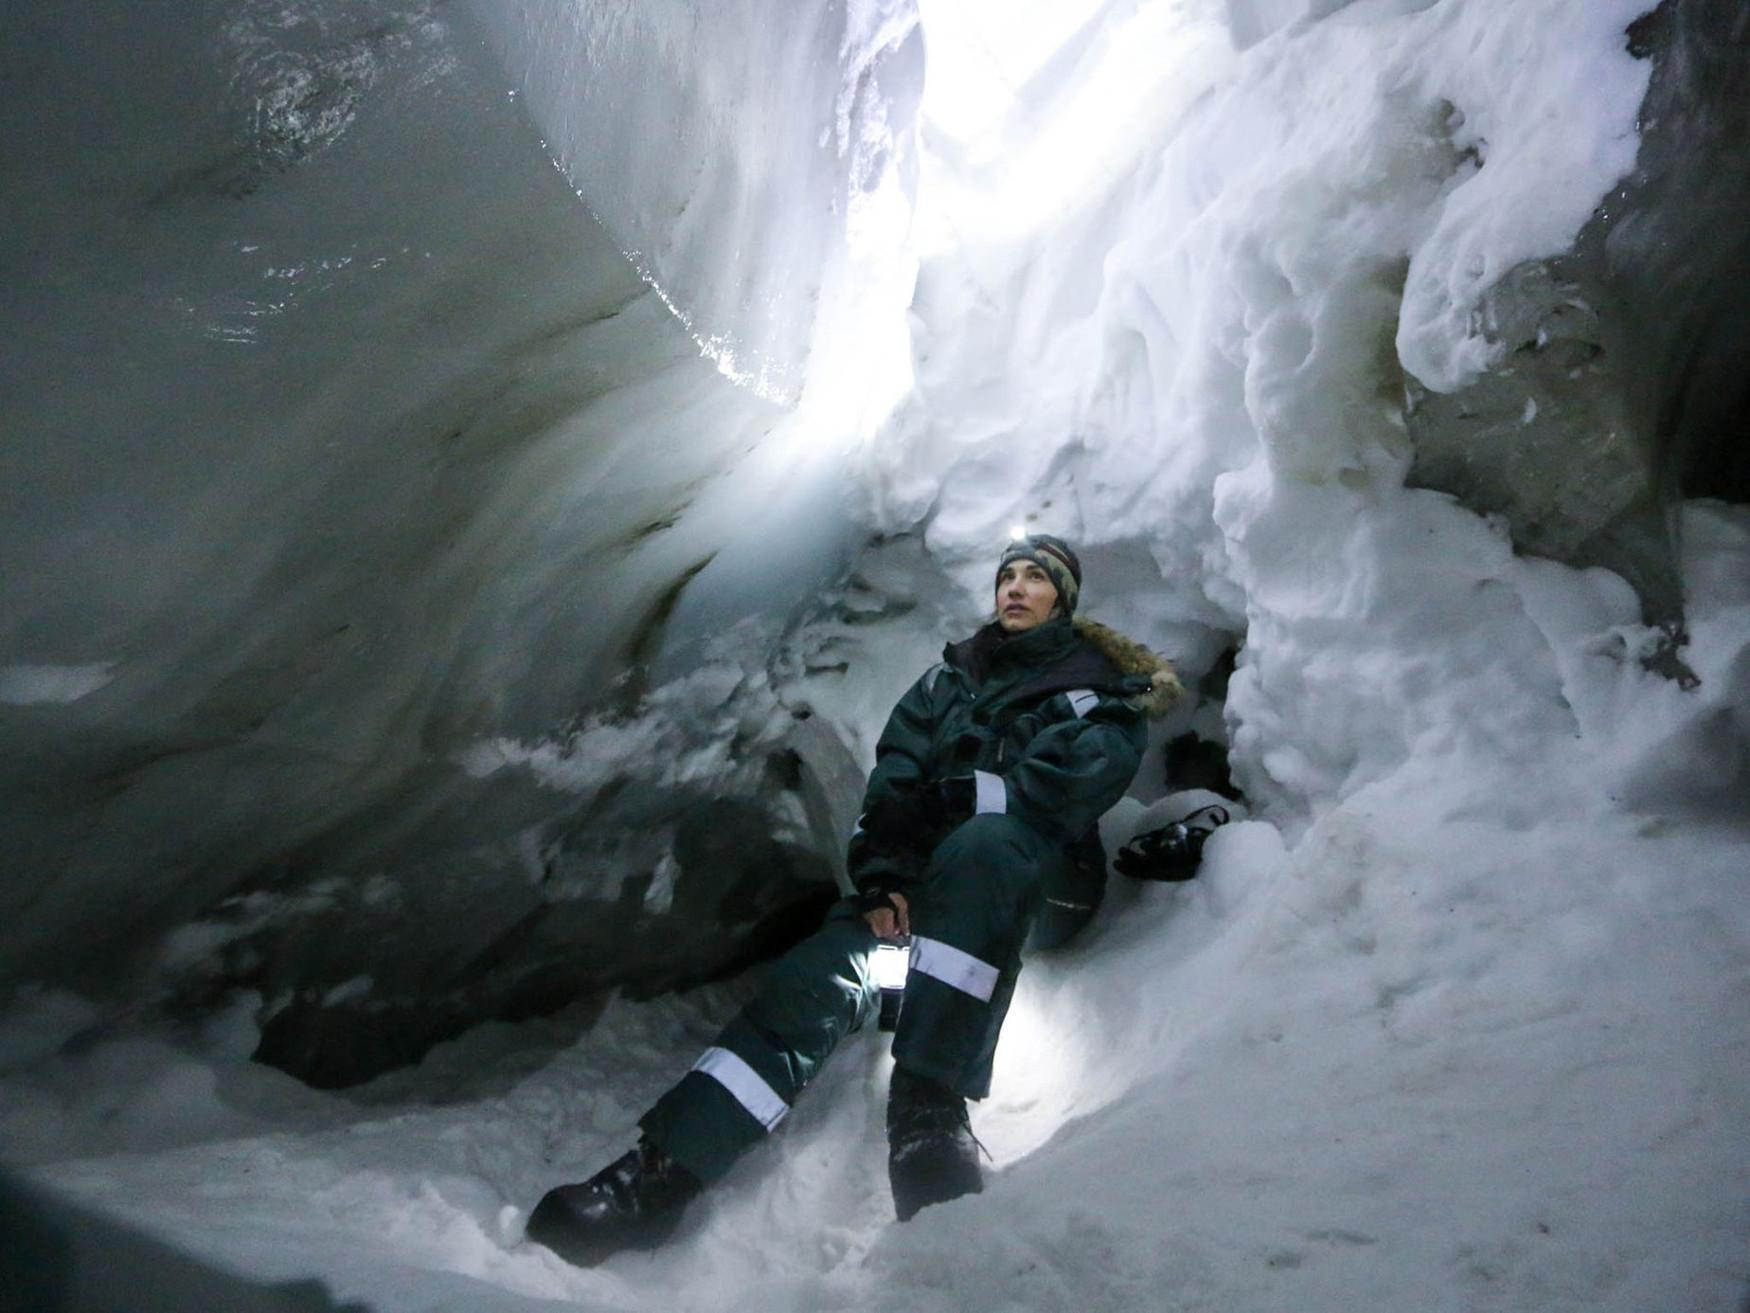 My work day is never the same, says Czech polar ecologist Marie Šabacká | Radio Prague International